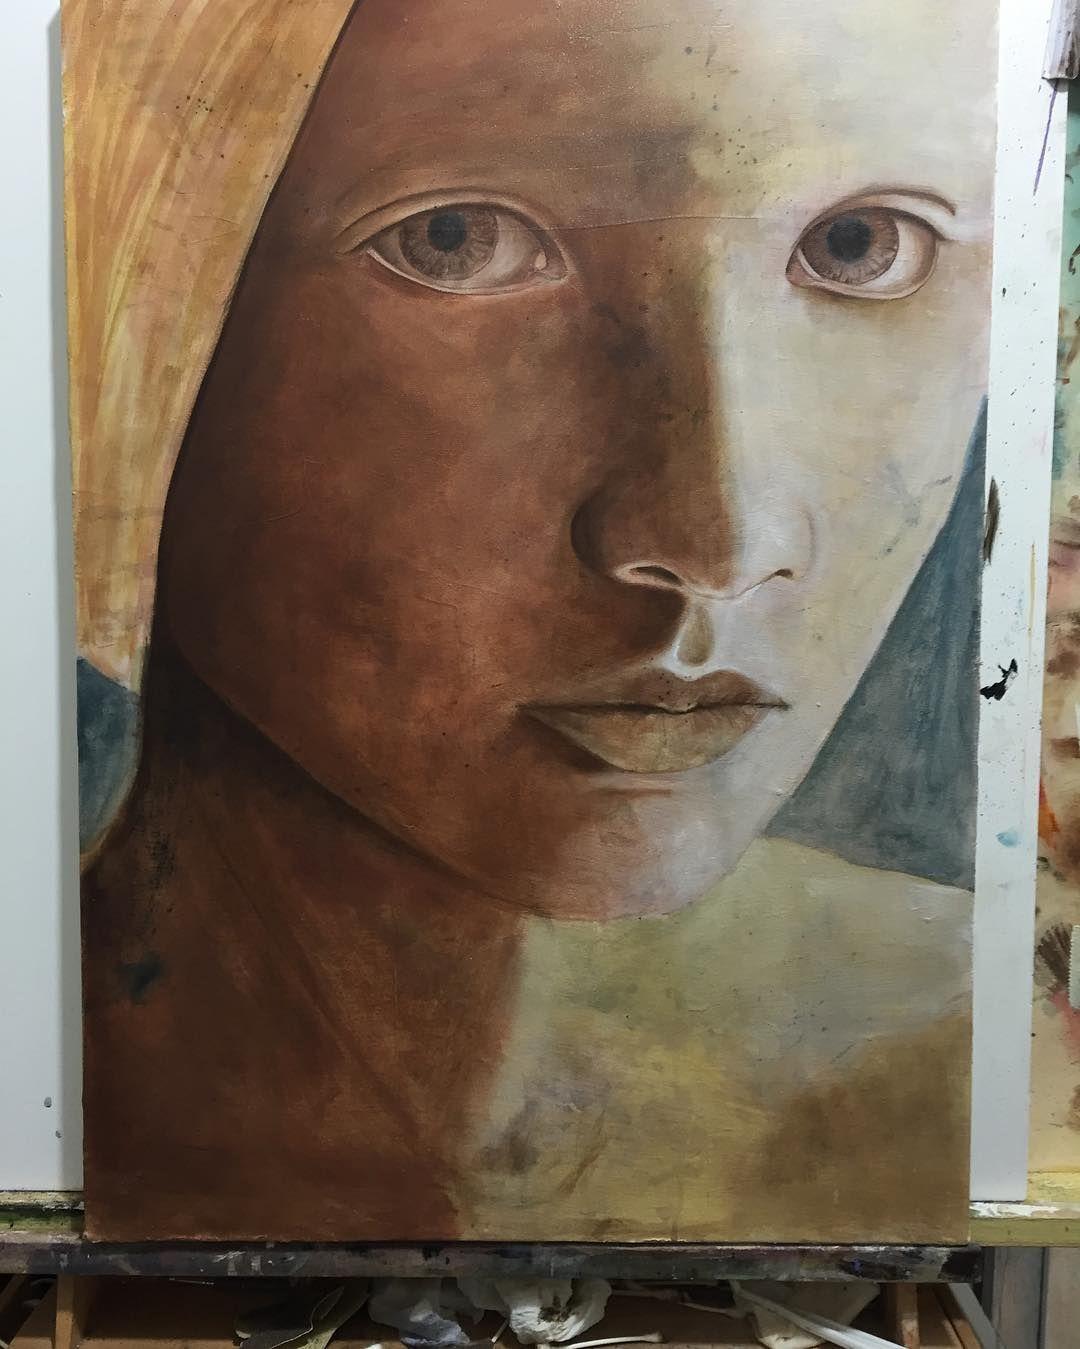 #beauty #paint #artwork #almazzaglia #originalart #oilpainting #oilpaint #artnews